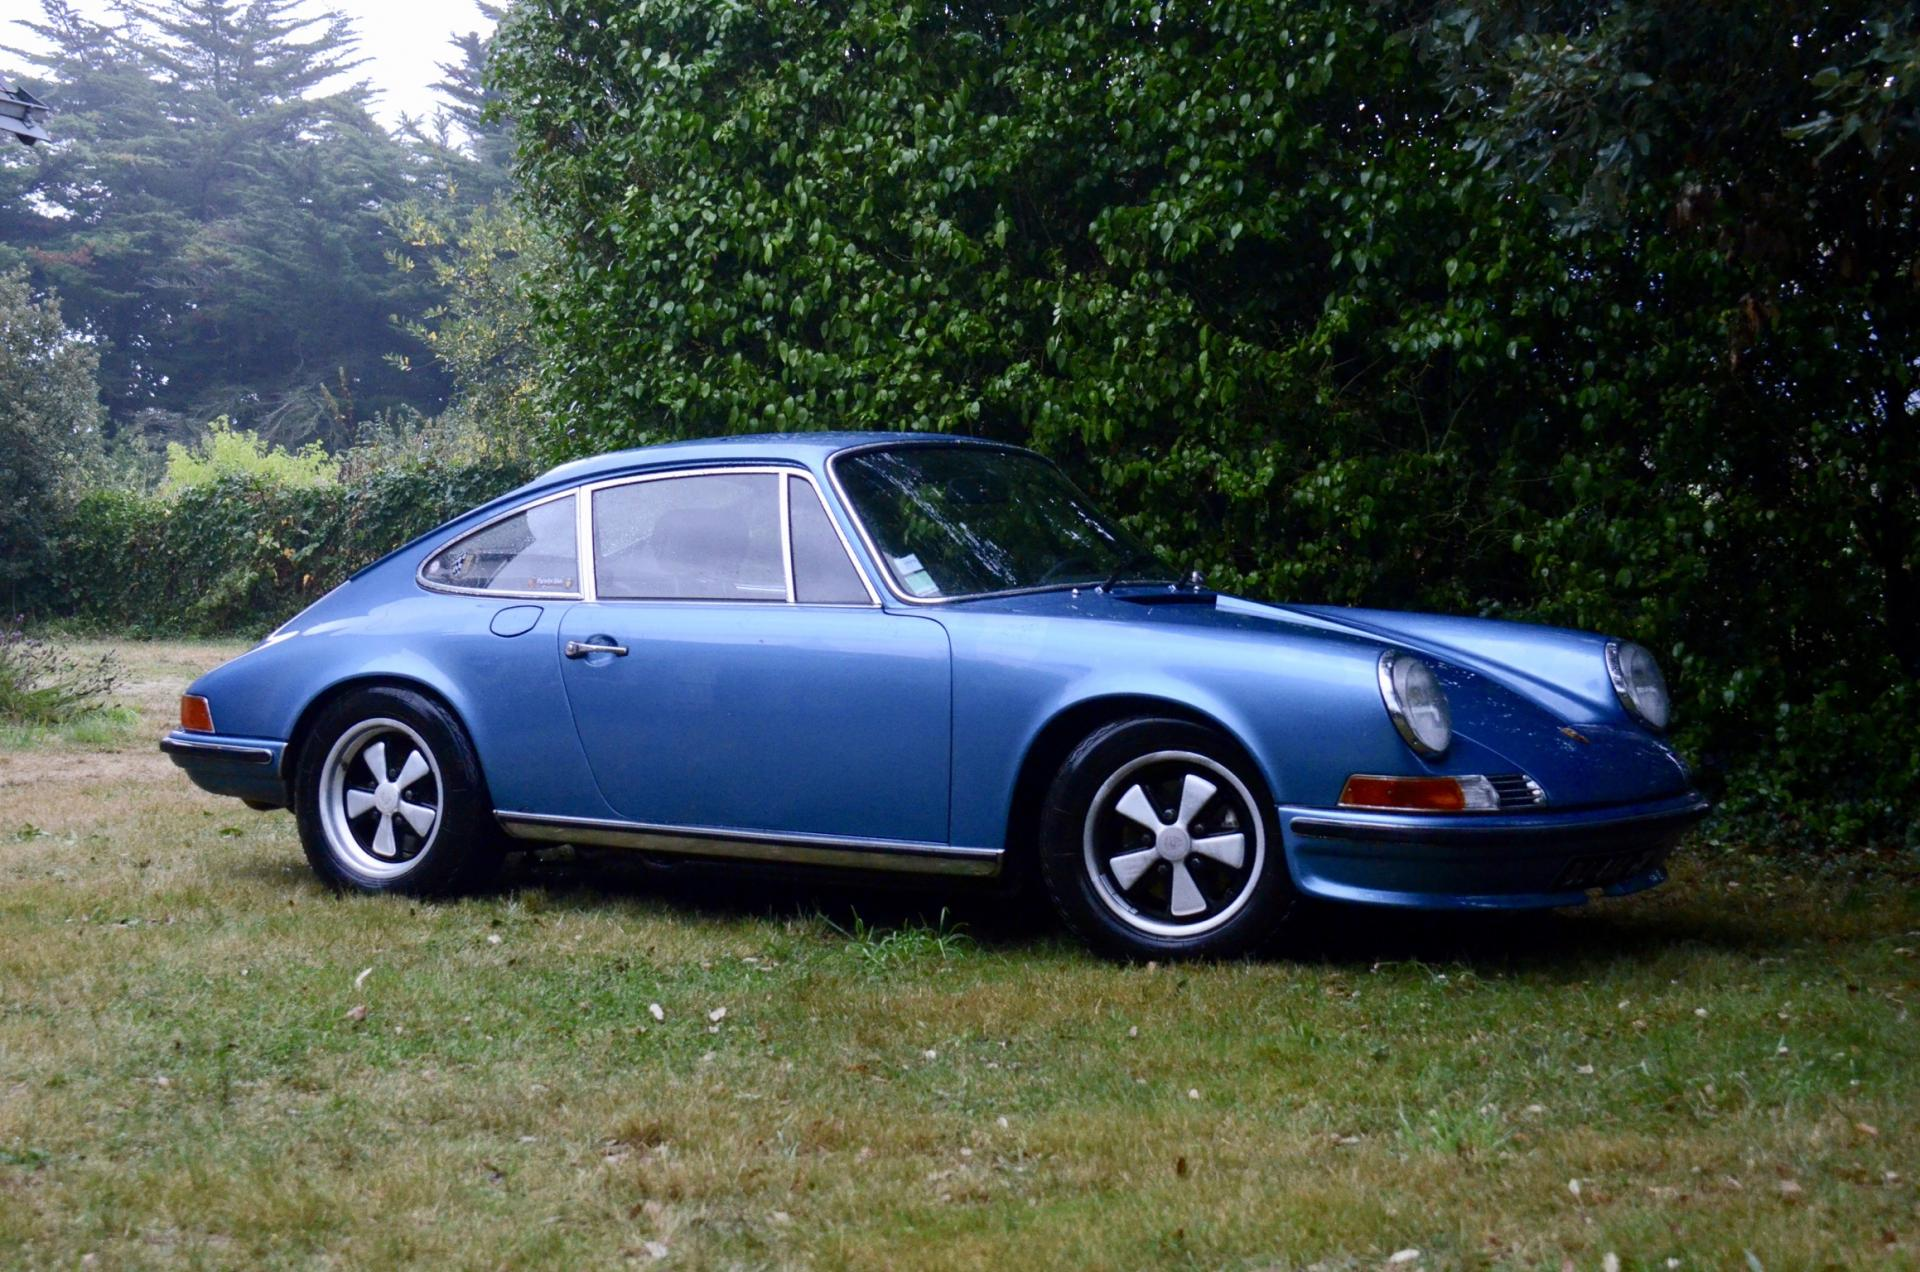 Porsche 911 S 2.4 (Porsche 911 classic (1964-1973))